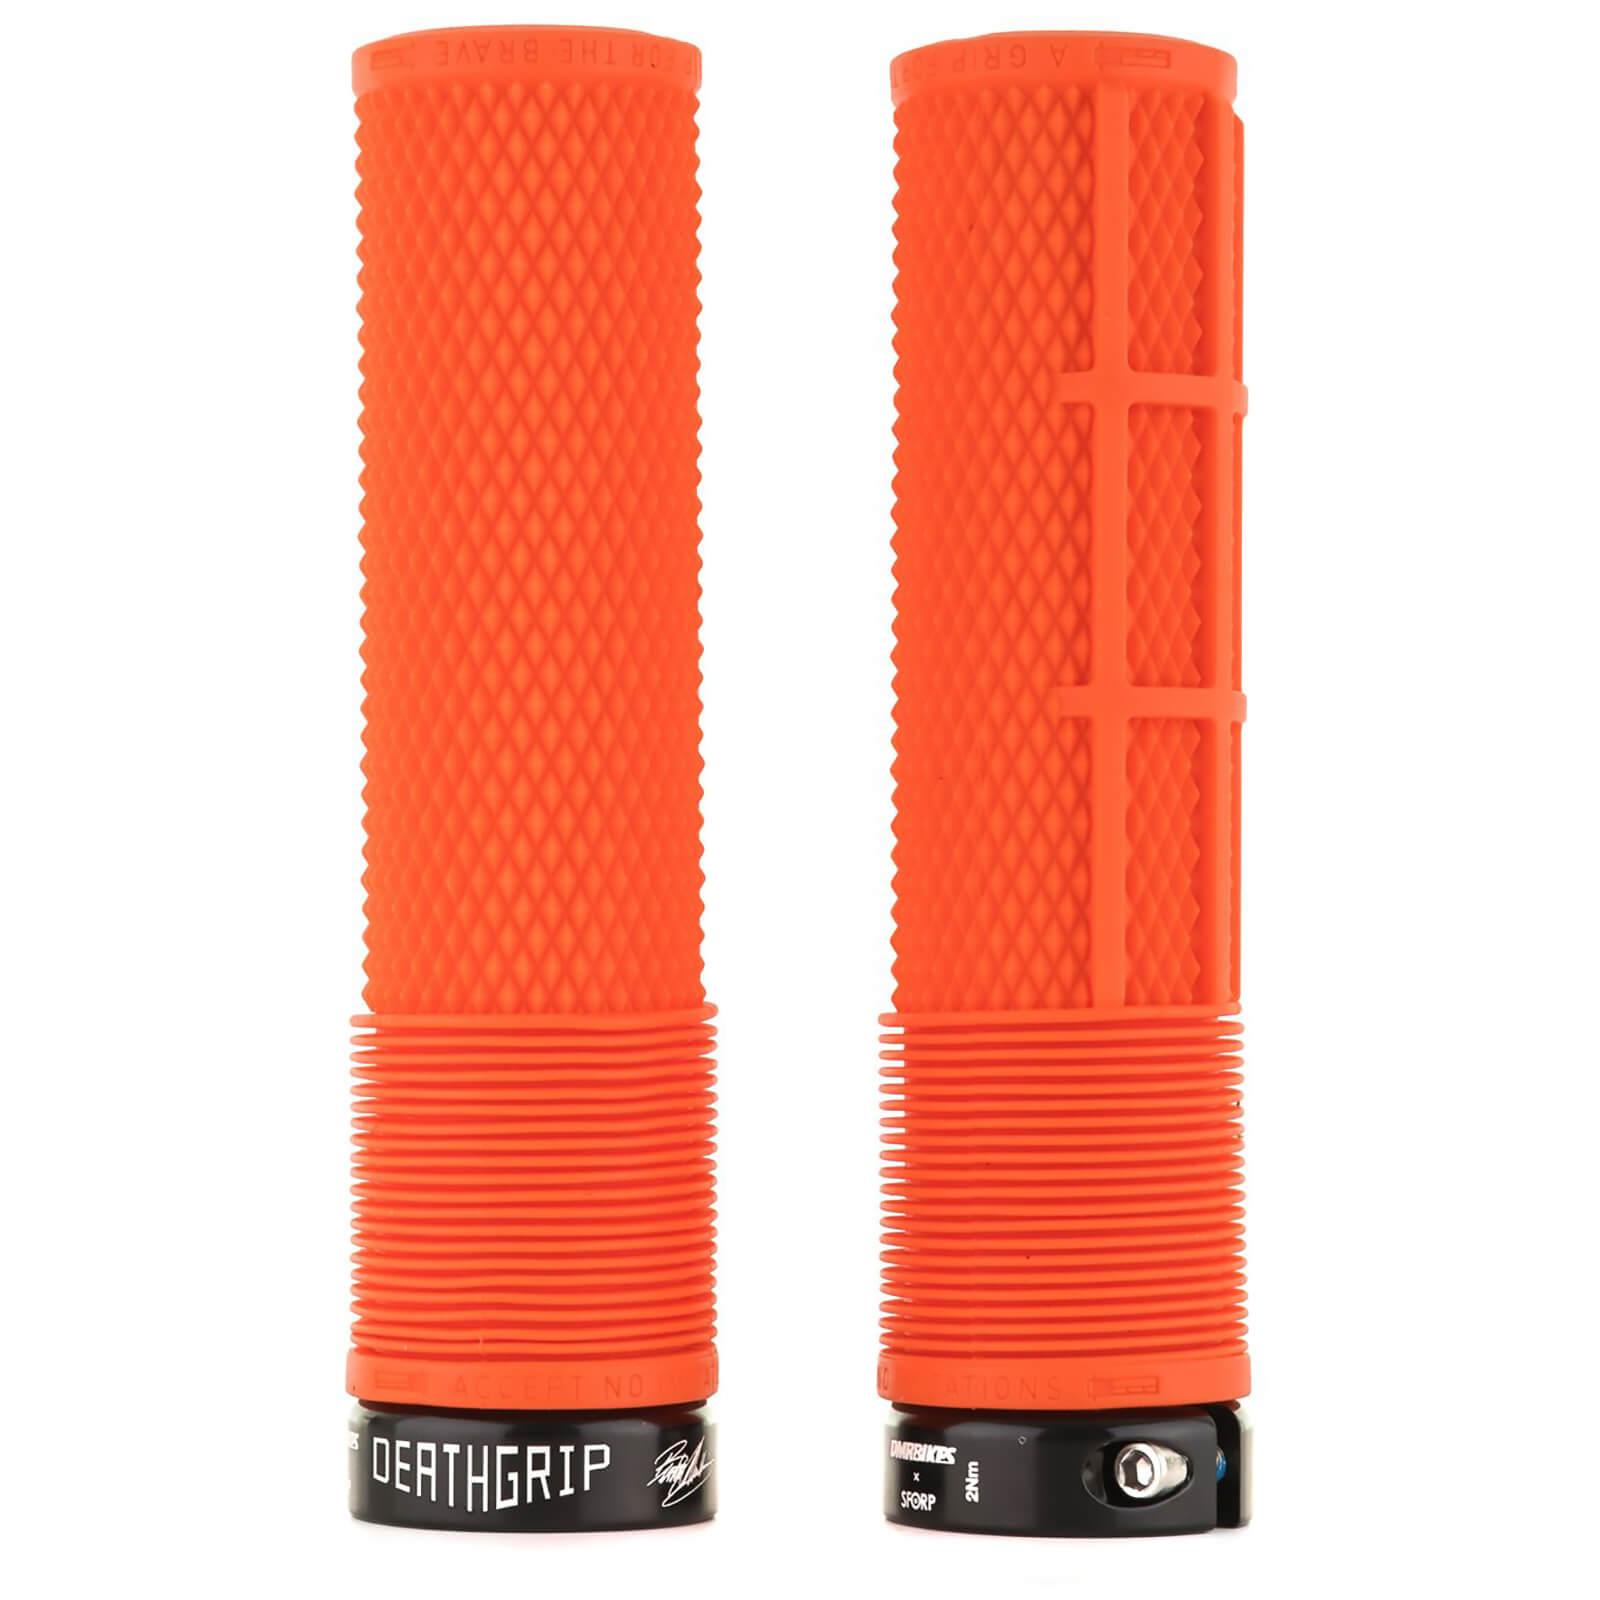 DMR Deathgrip Flangeless Handlebar Grip - Thick - 31.3mm - Tango